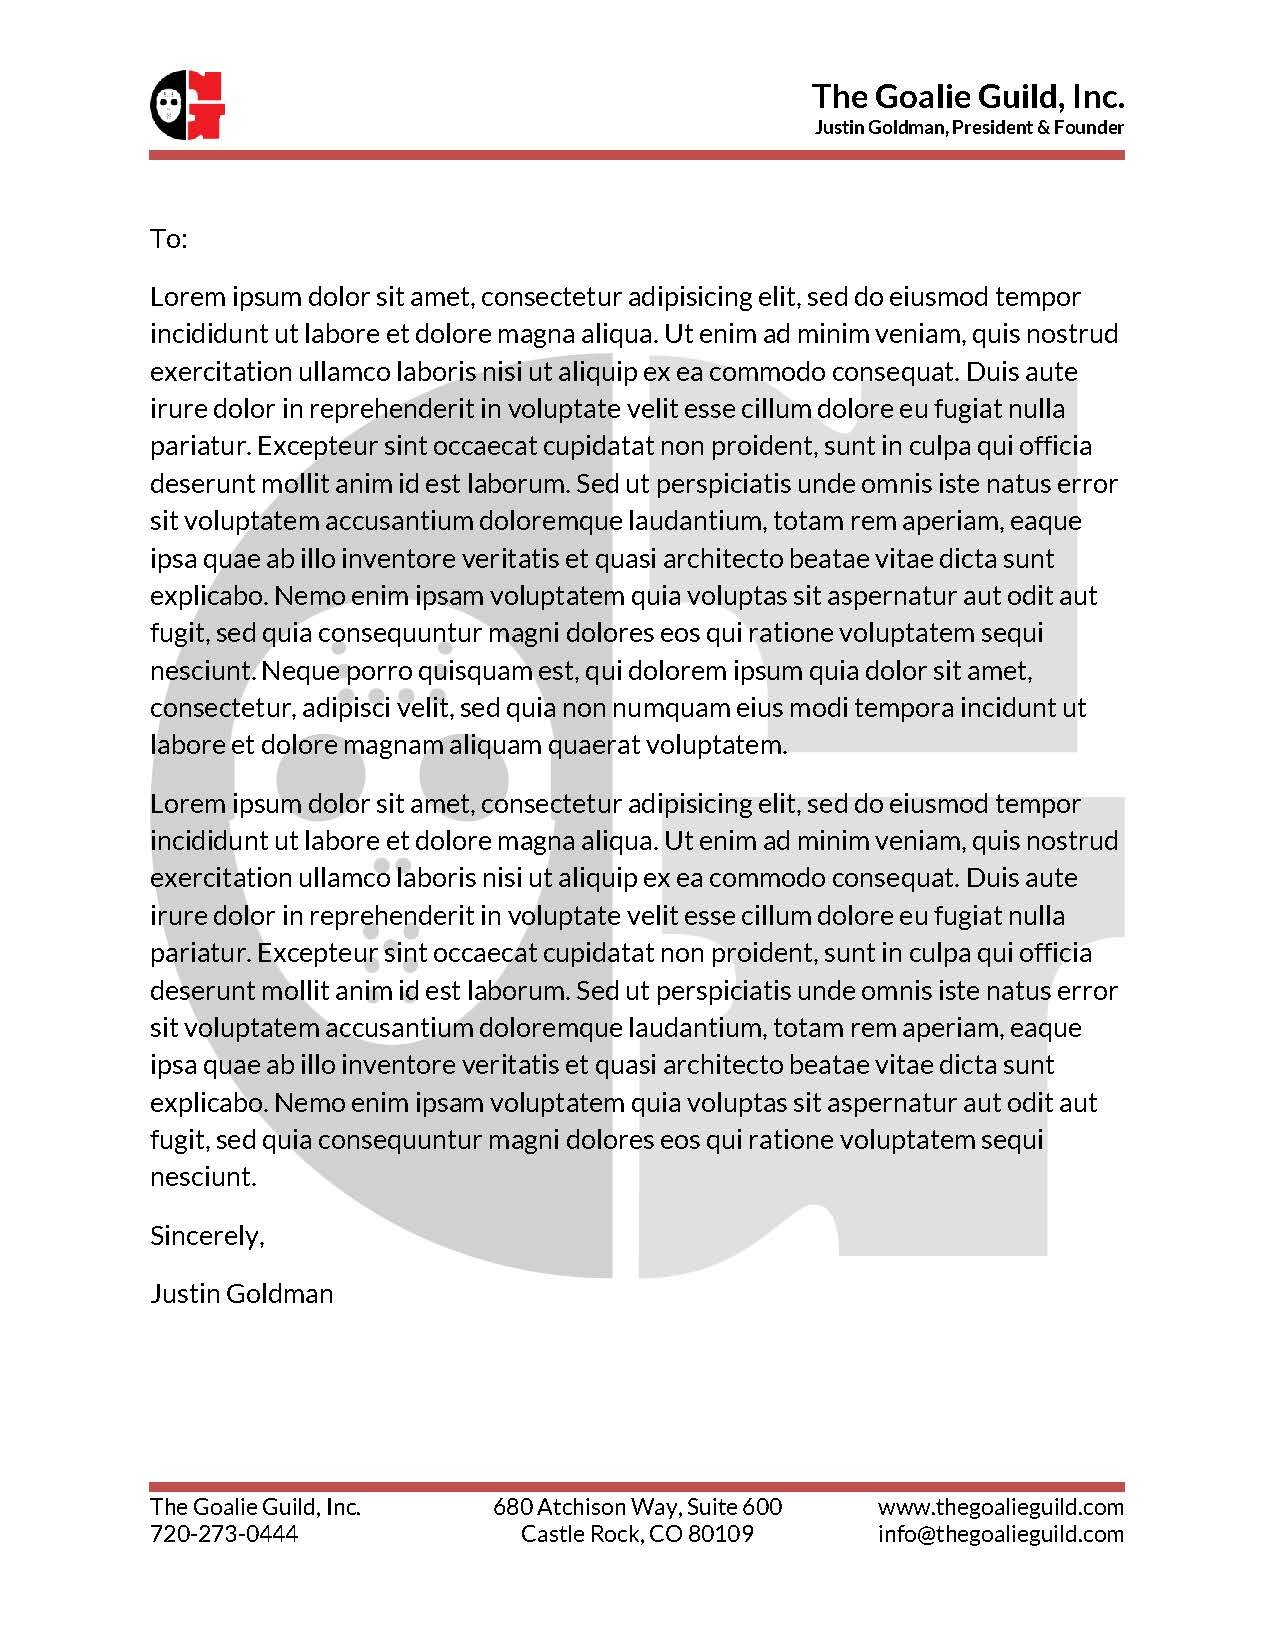 The Goalie Guild Letter Head & Release